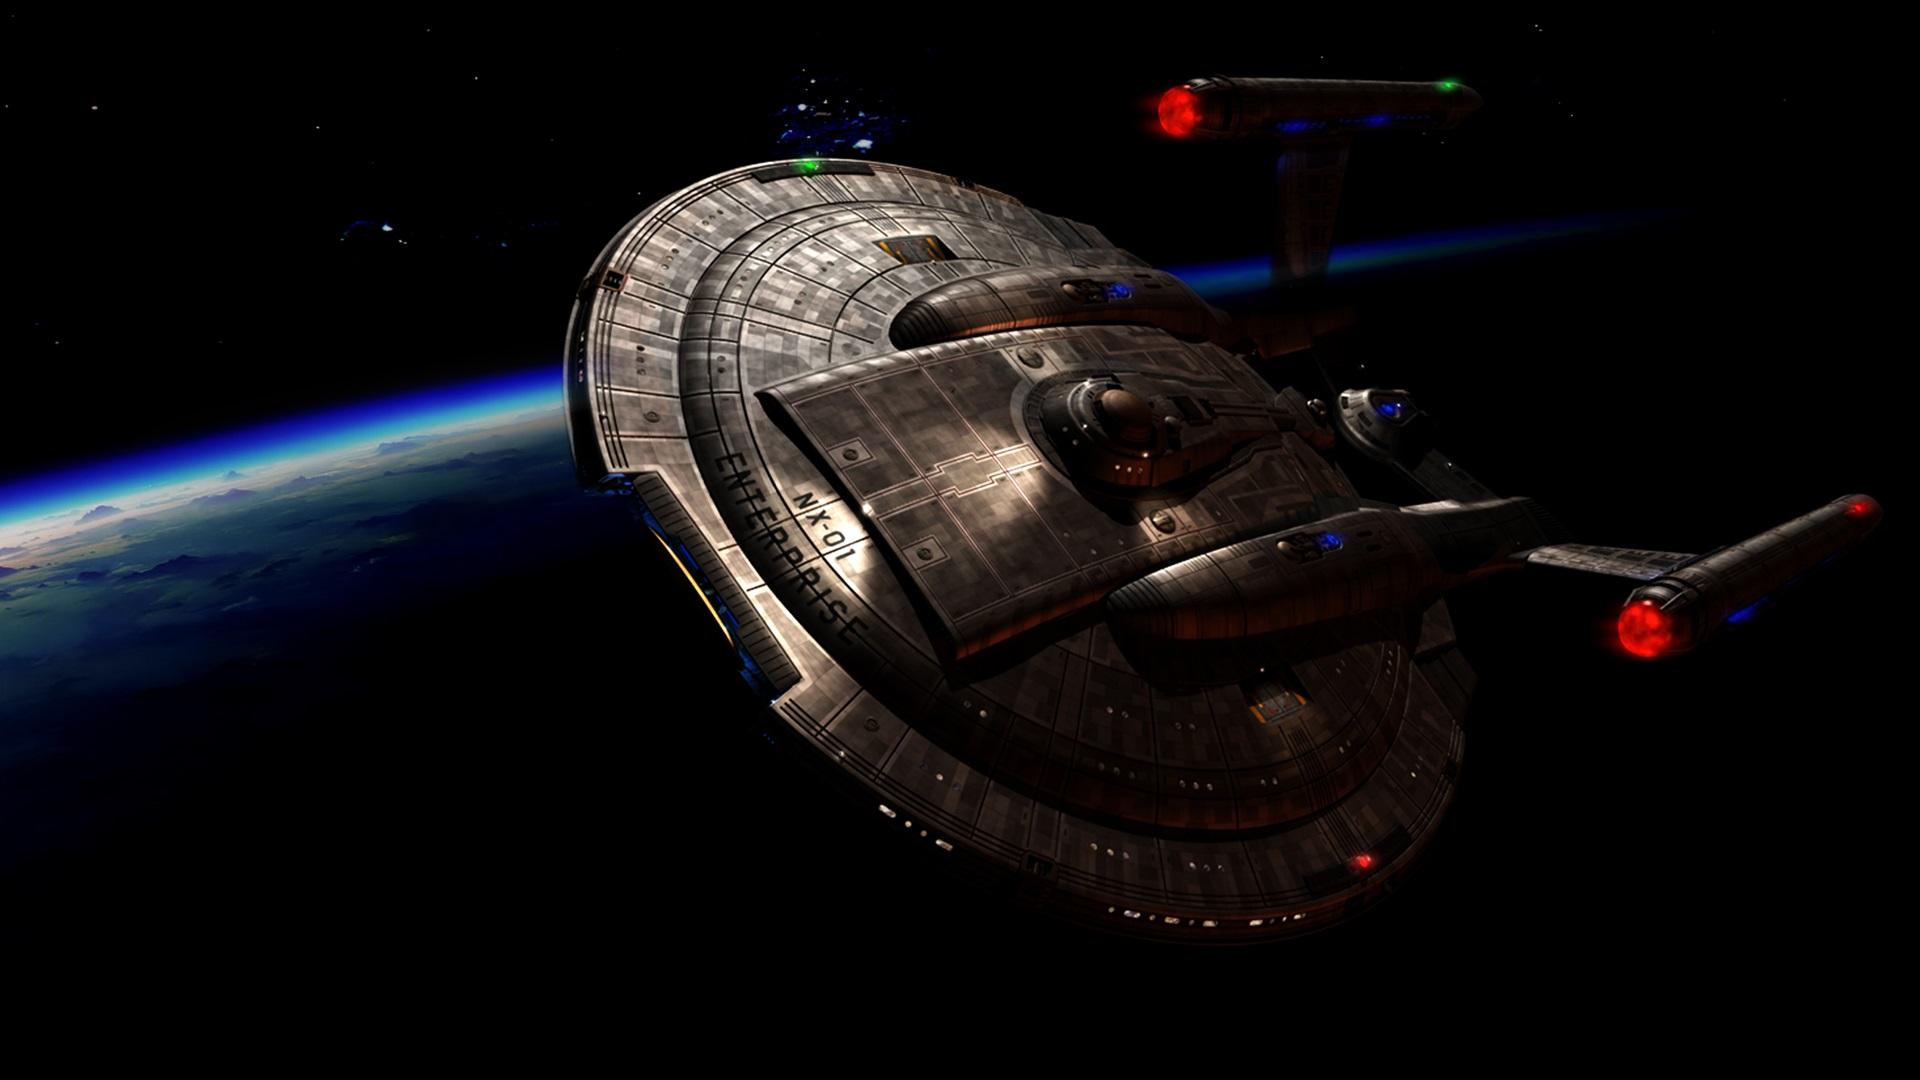 Star Trek Enterprise Fondo De Pantalla Hd Fondo De